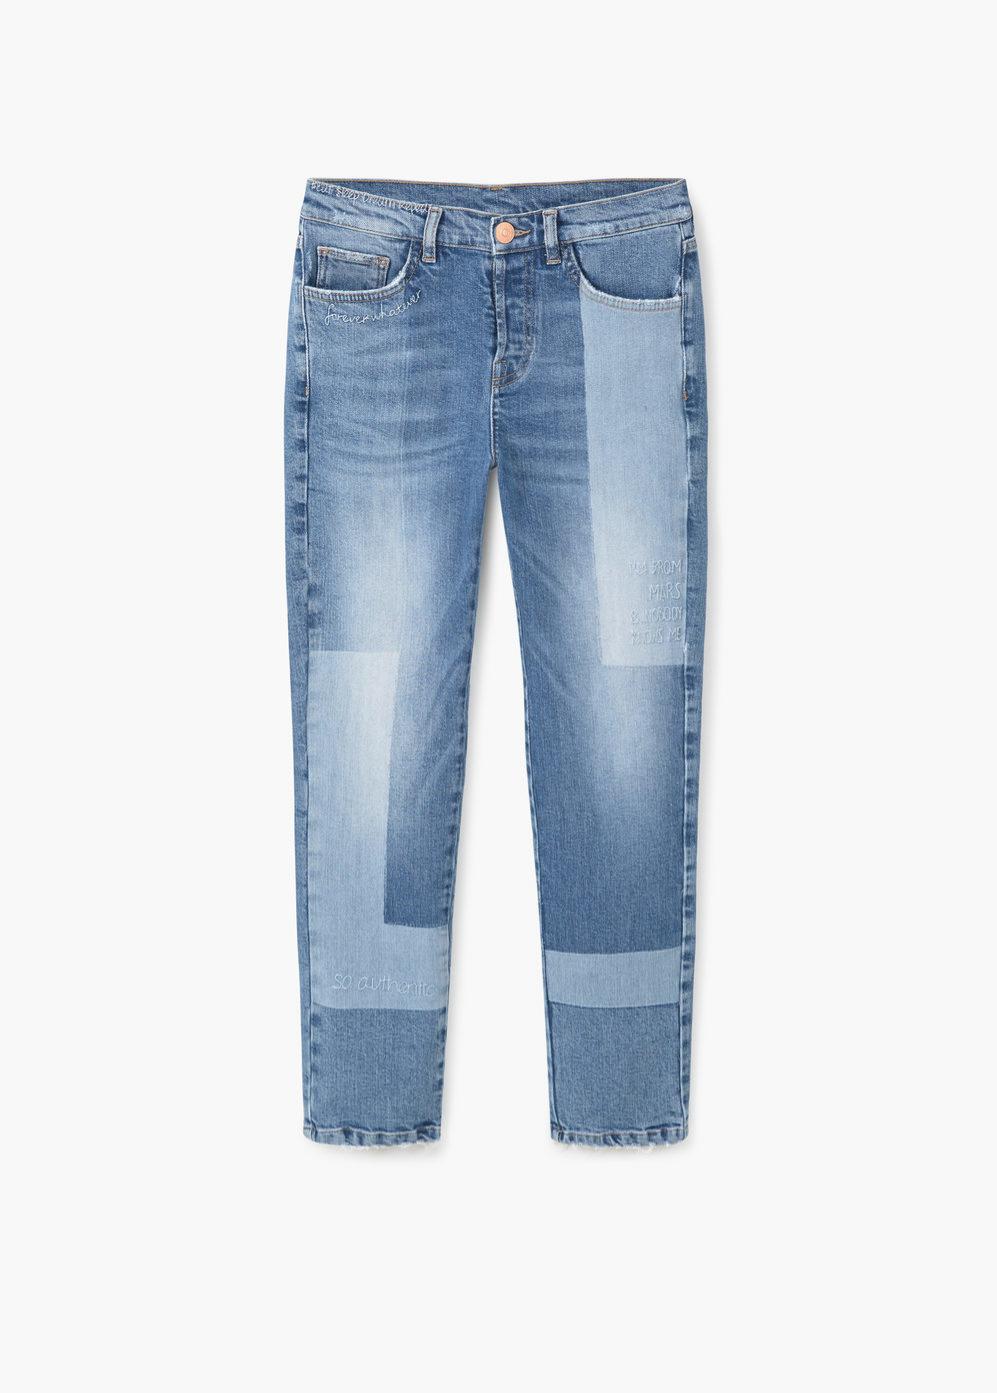 Pantalones con detalles bicolor. De Mango, 39,99 euros.